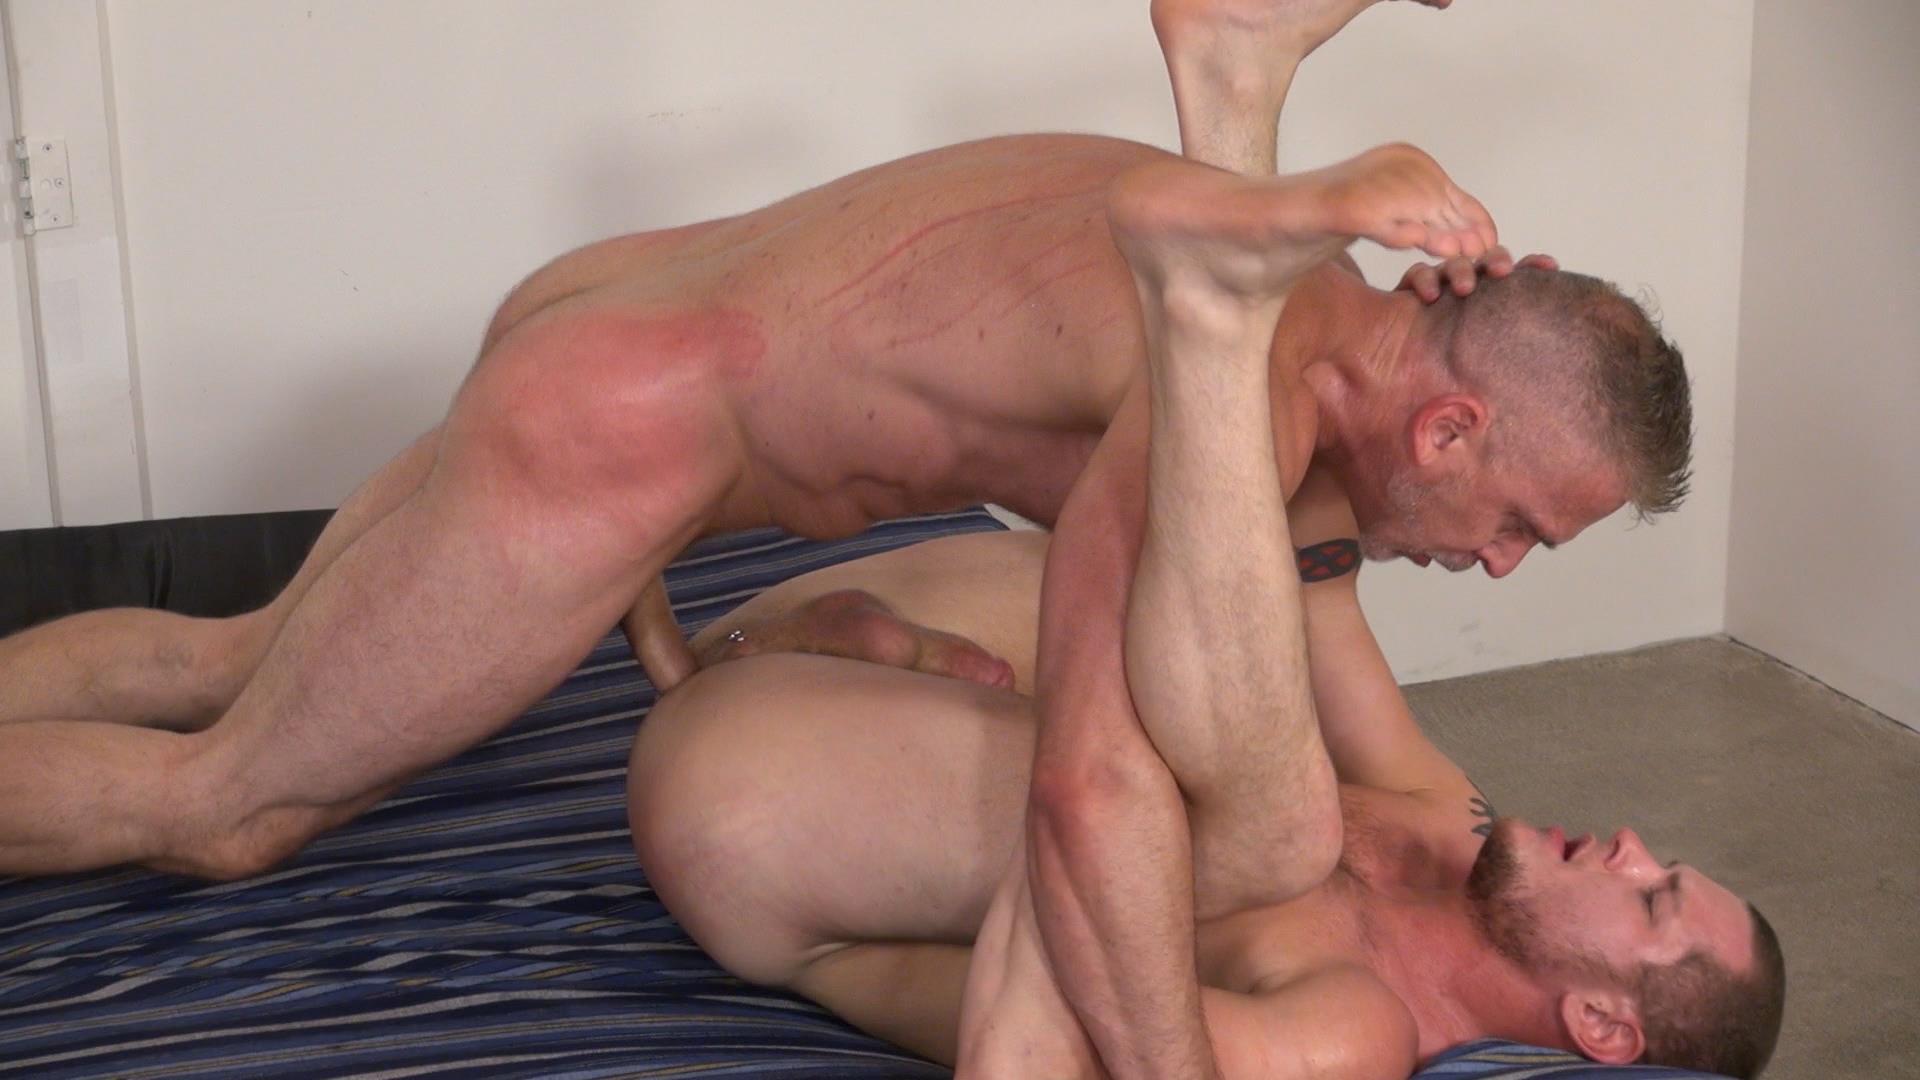 Raw-and-Rough-Sam-Dixon-and-Blue-Bailey-Daddy-And-Boy-Flip-Flip-Bareback-Fucking-Amateur-Gay-Porn-07 Blue Bailey Flip Flop Barebacking With A Hung Daddy